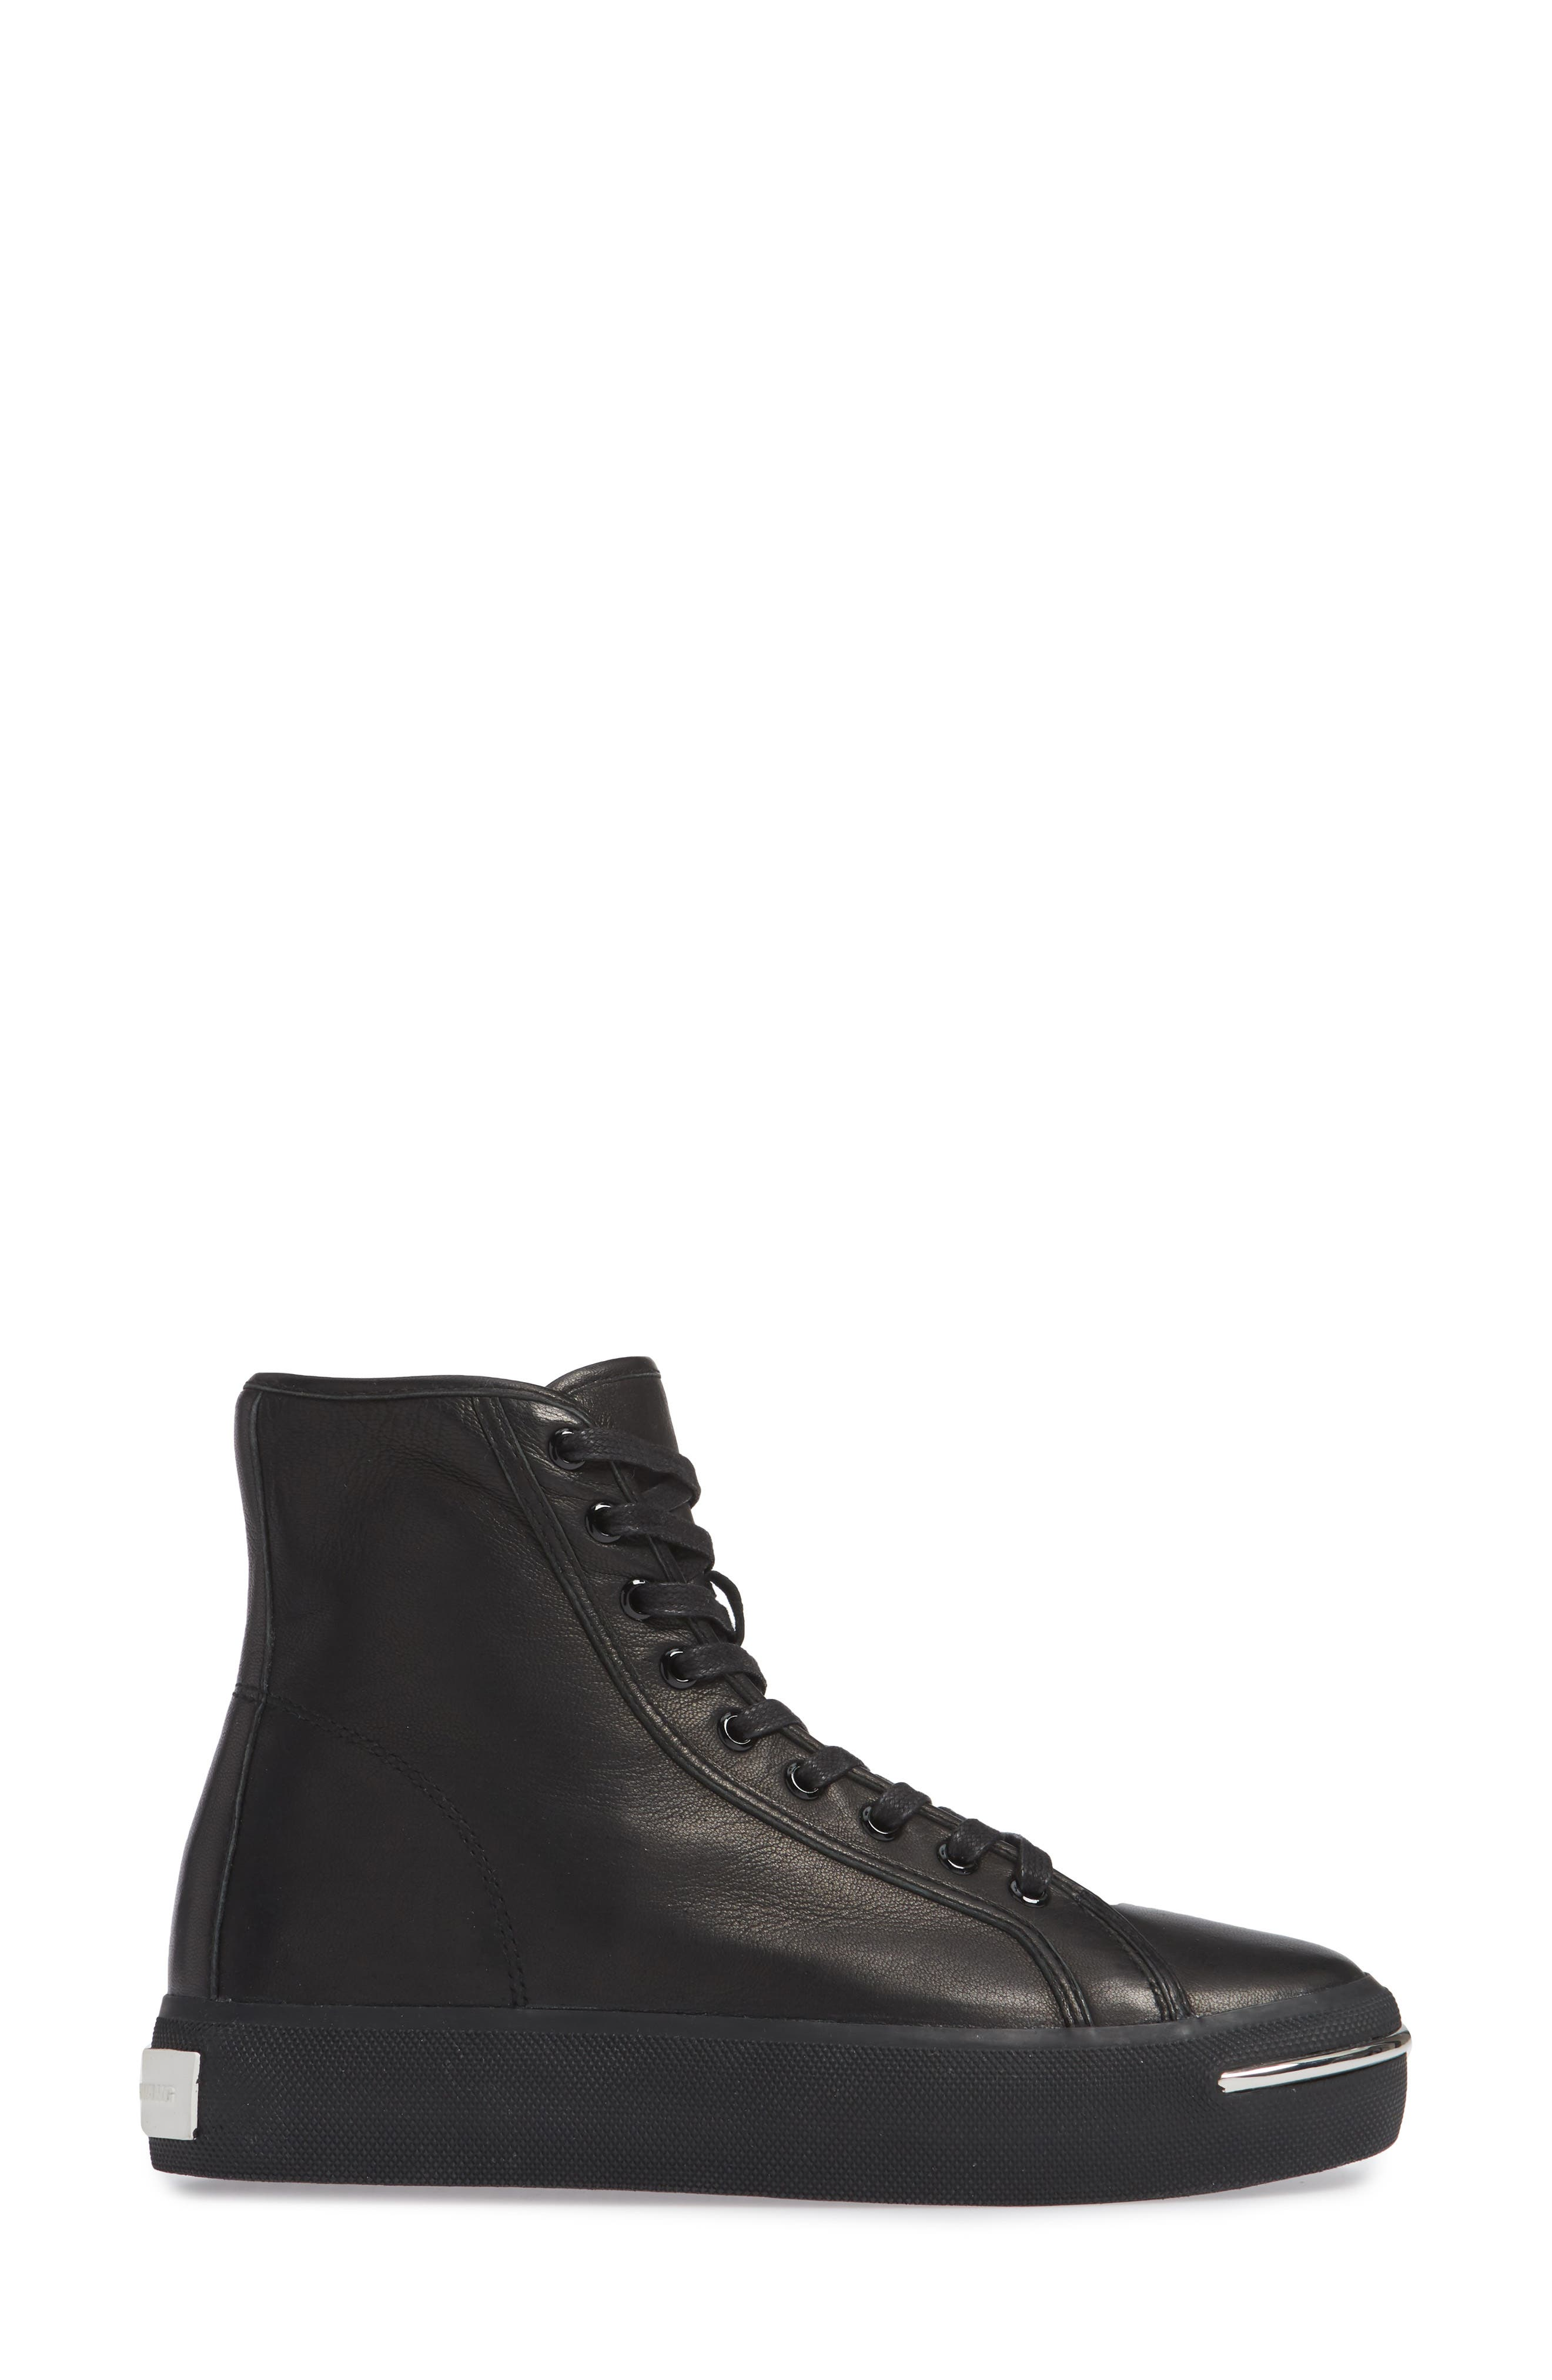 ALEXANDER WANG, Pia High Top Sneaker, Alternate thumbnail 3, color, BLACK